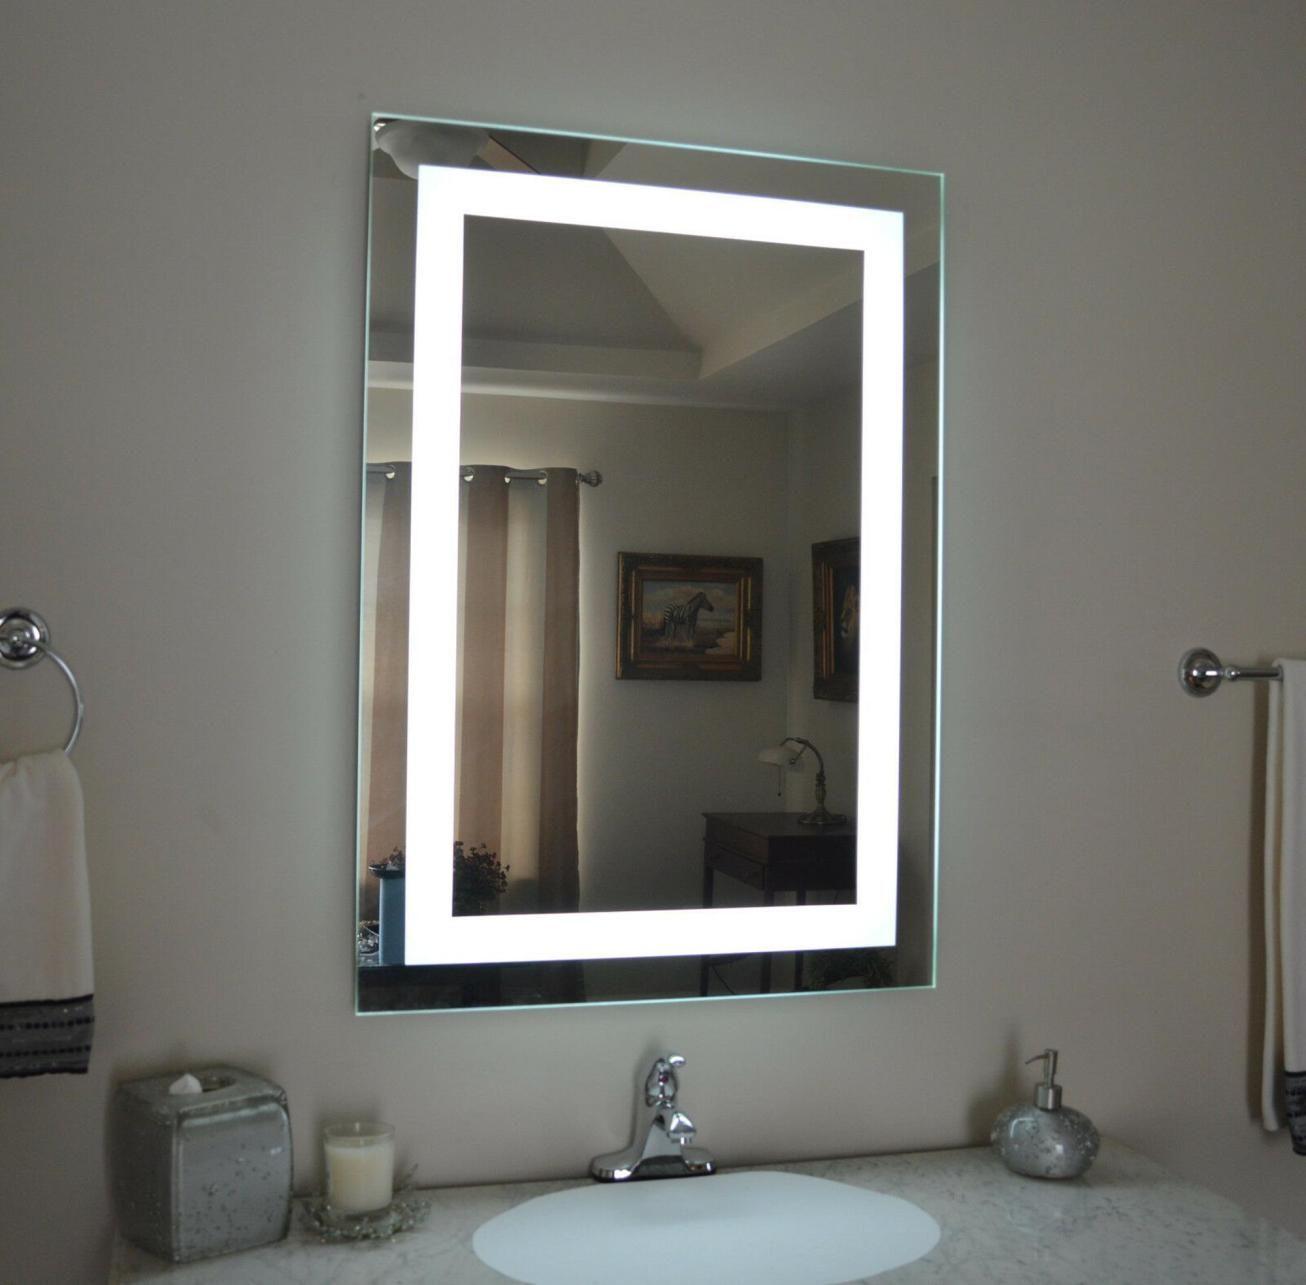 35 Stunning Bathroom Vanity Mirrors With Light Designs Lighted Vanity Mirror Bathroom Mirror Lights Diy Vanity Mirror